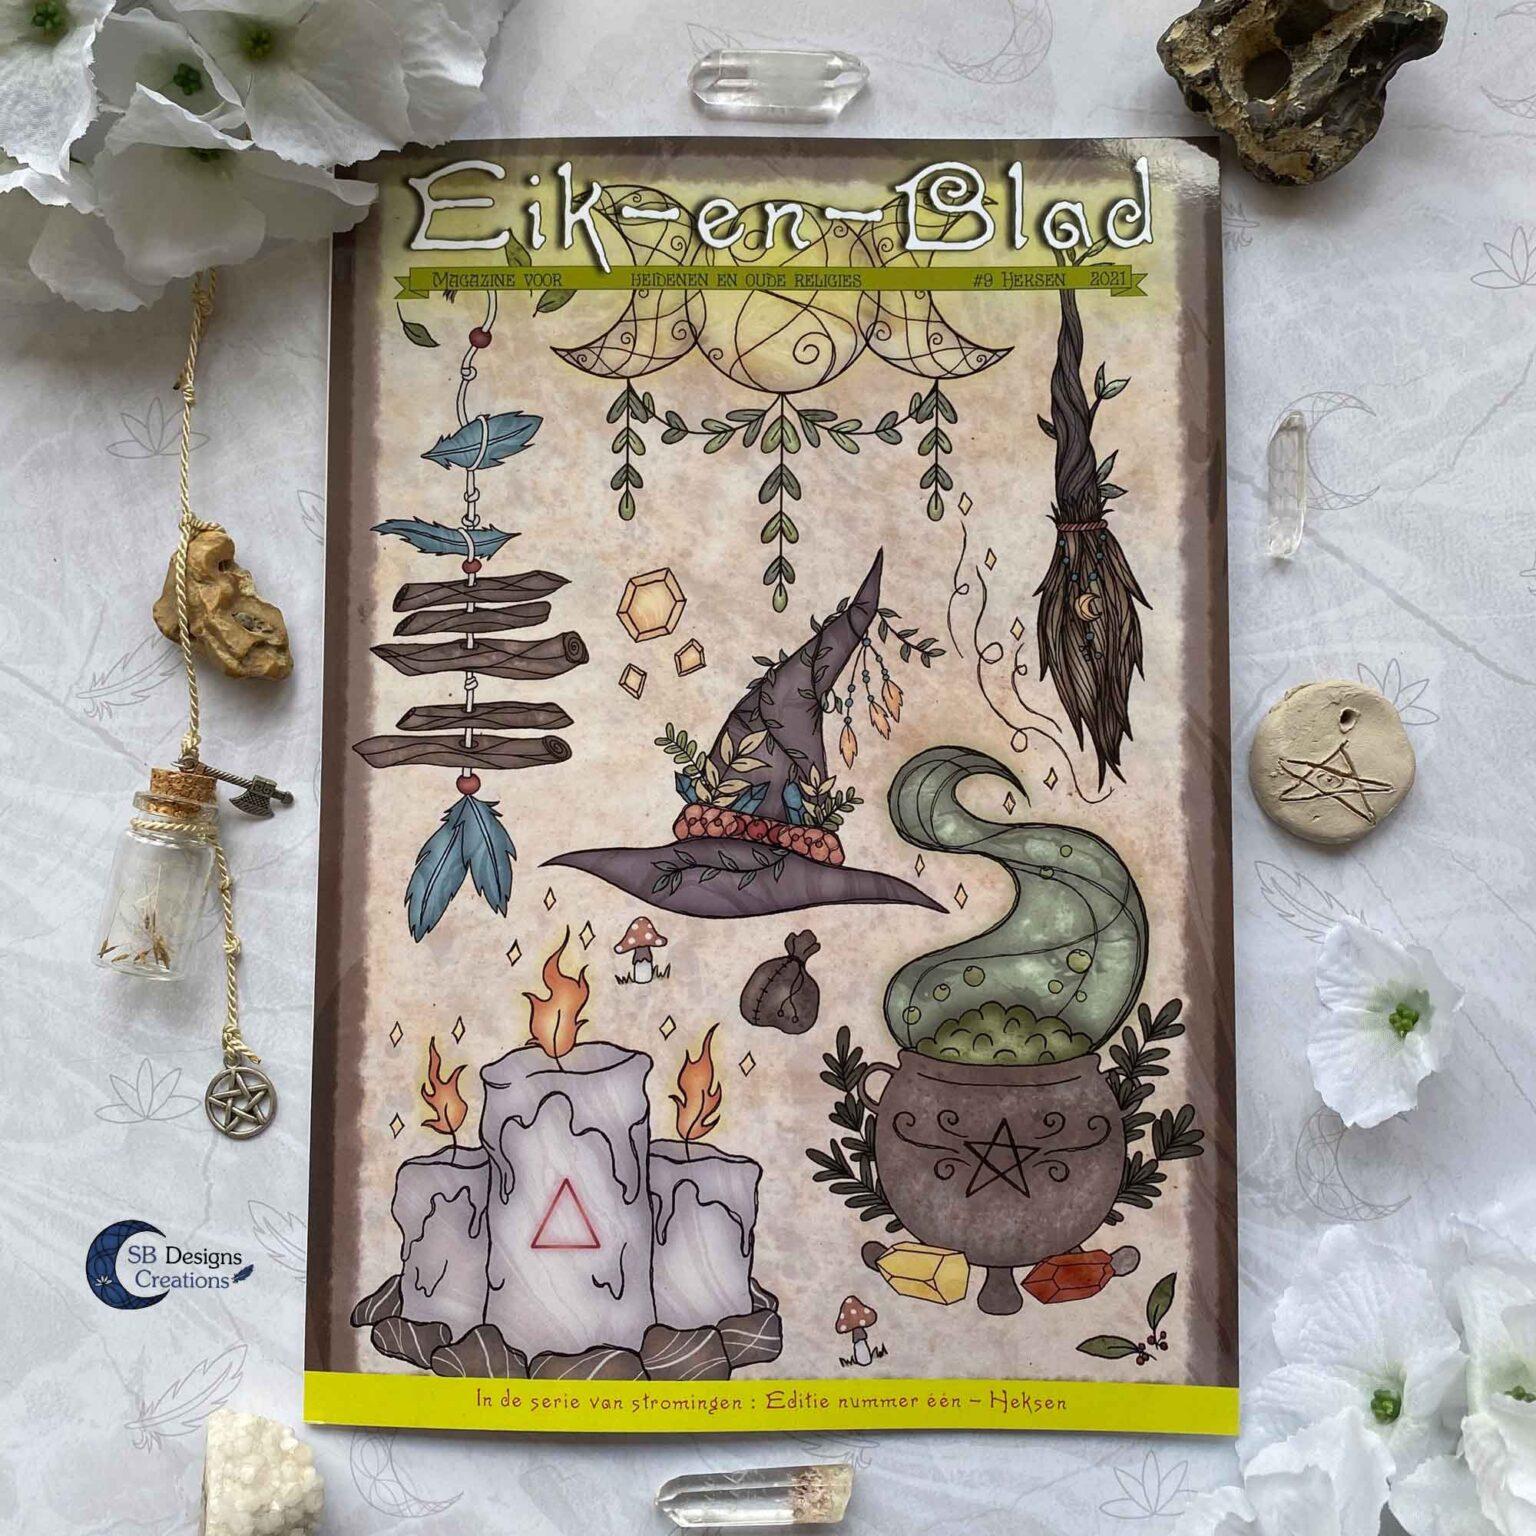 Eik-en-Blad-Heksen-Uitgave-Cover-illustratie-1536x1536